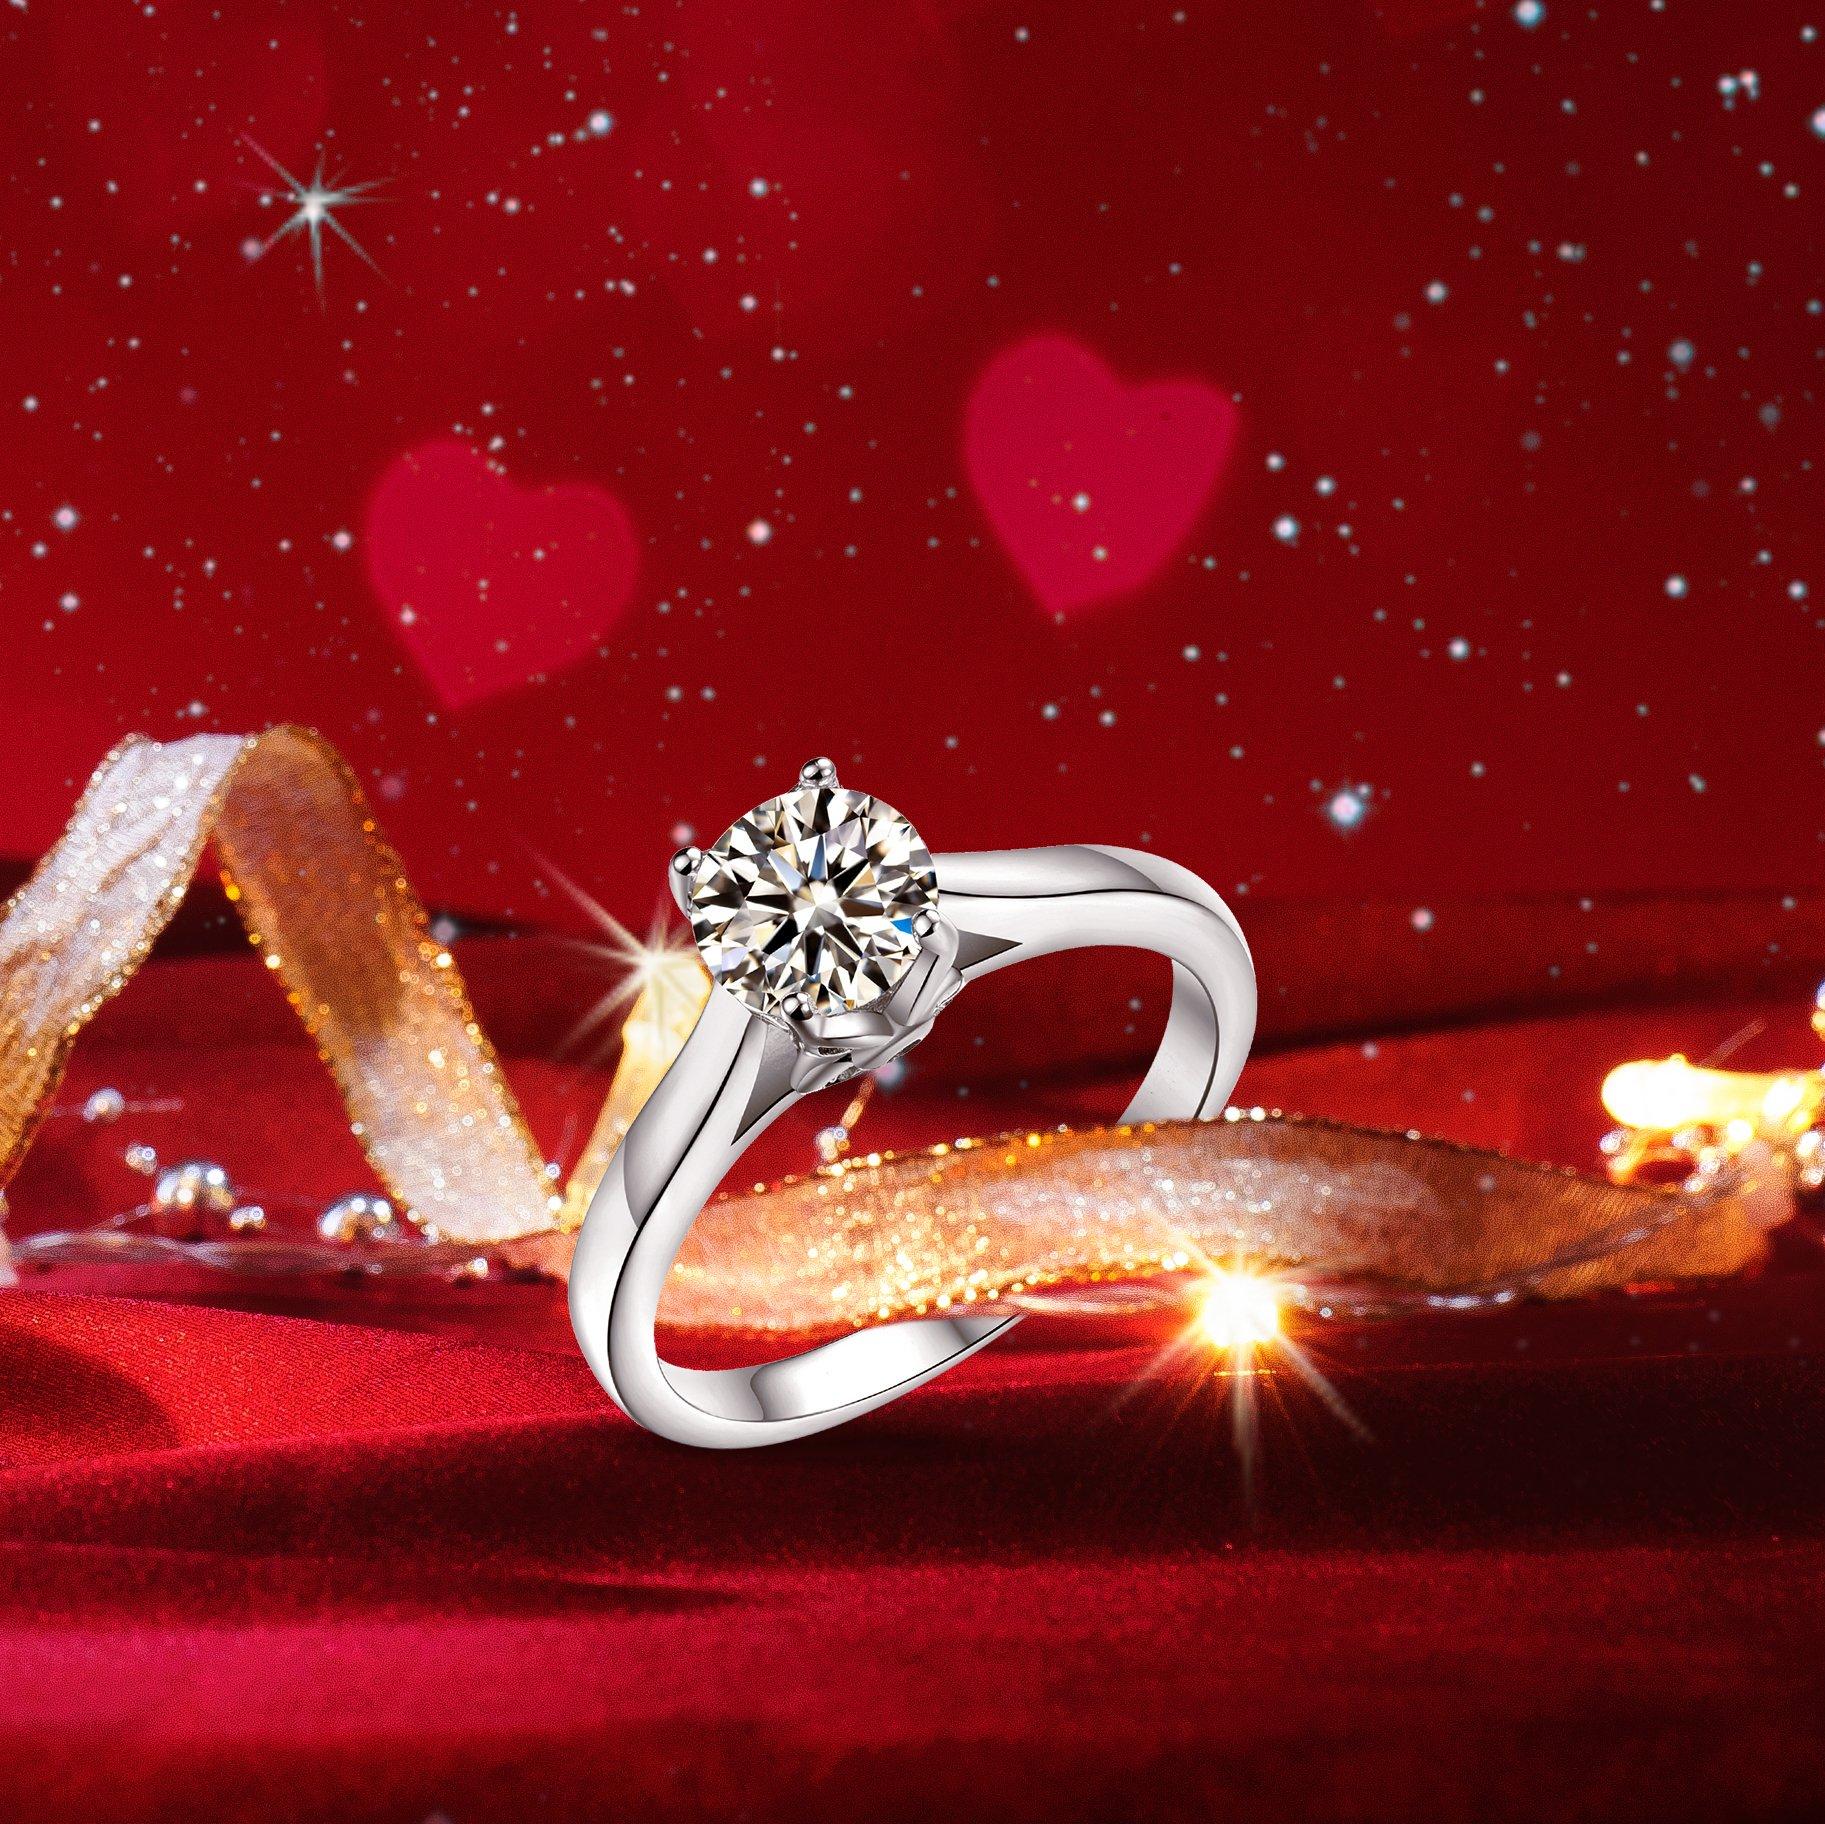 Sreema London 925 Sterling Silver Round Cut Floral Wedding Rings P